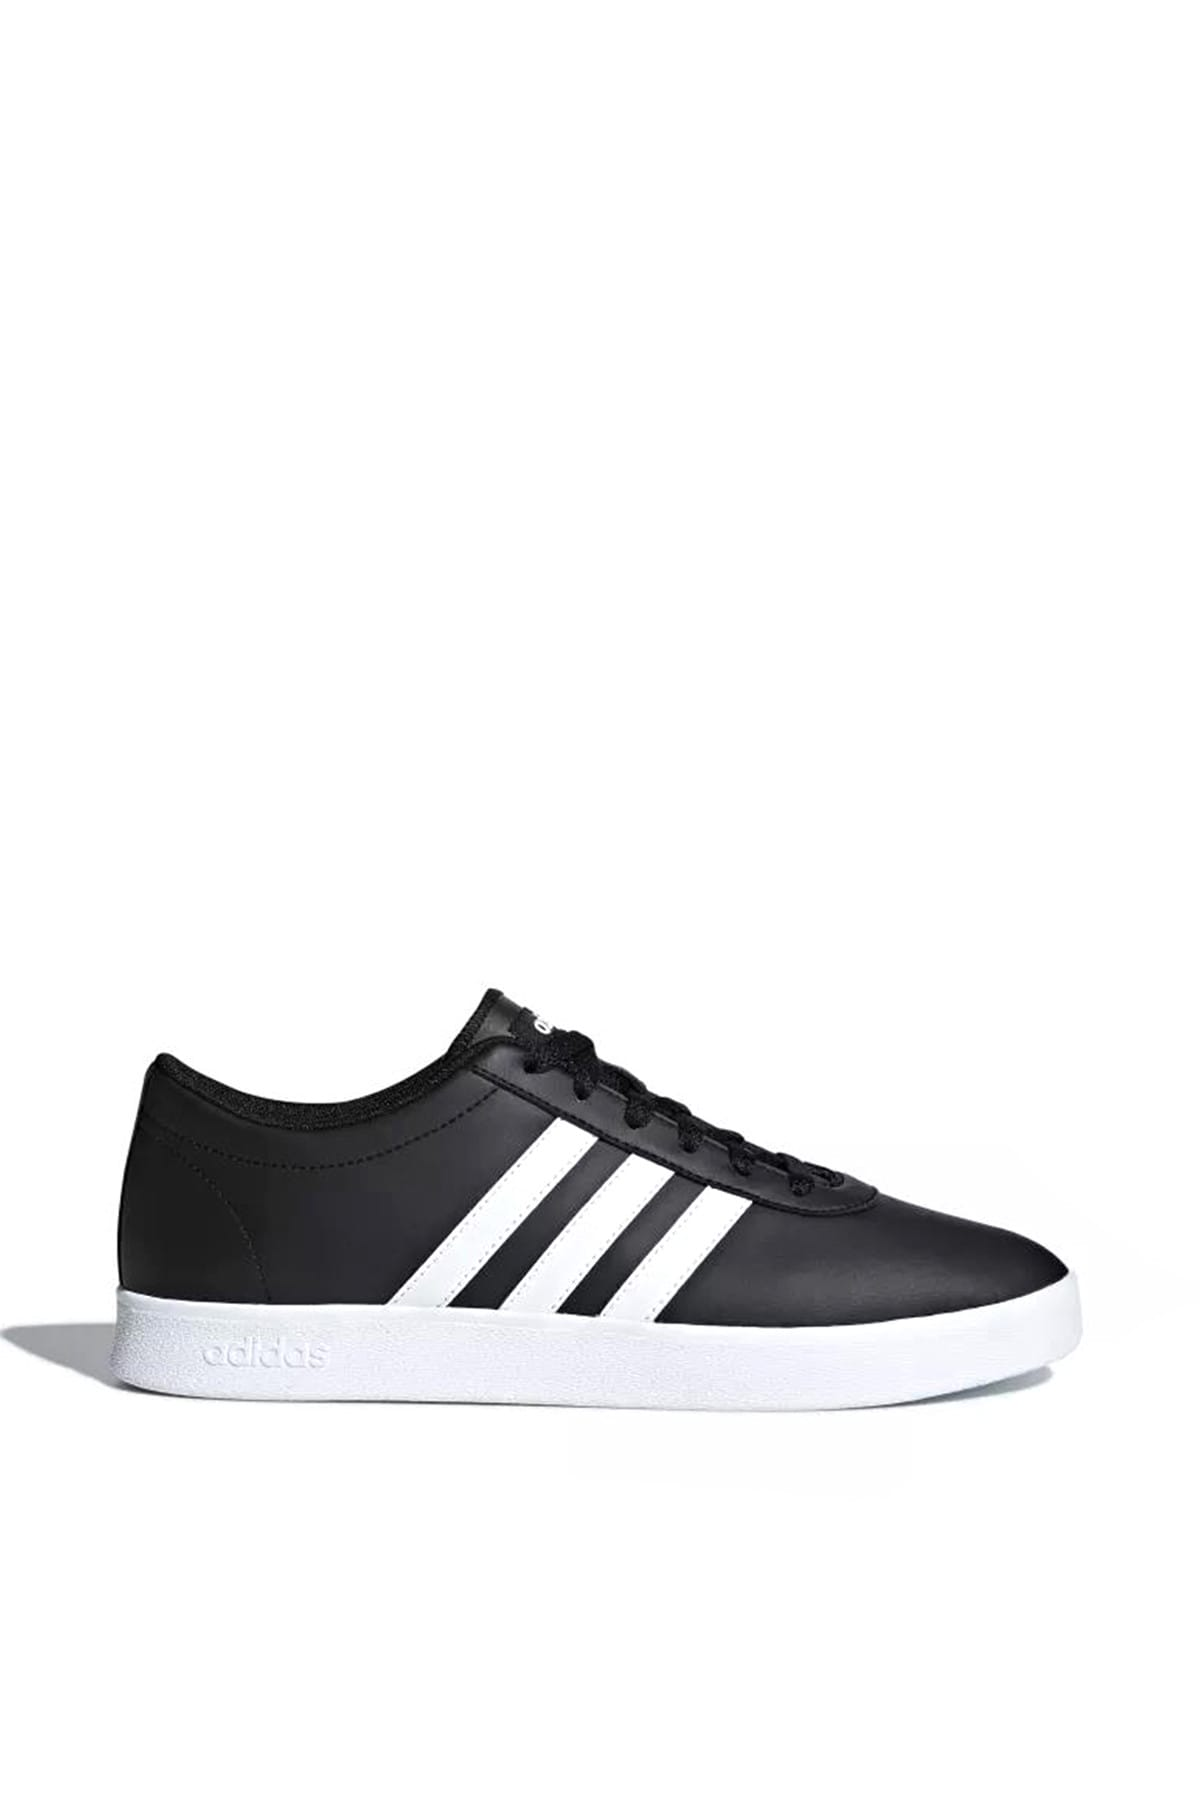 adidas Cf Advantage Siyah BEYAZ Erkek Sneaker 100351226 1